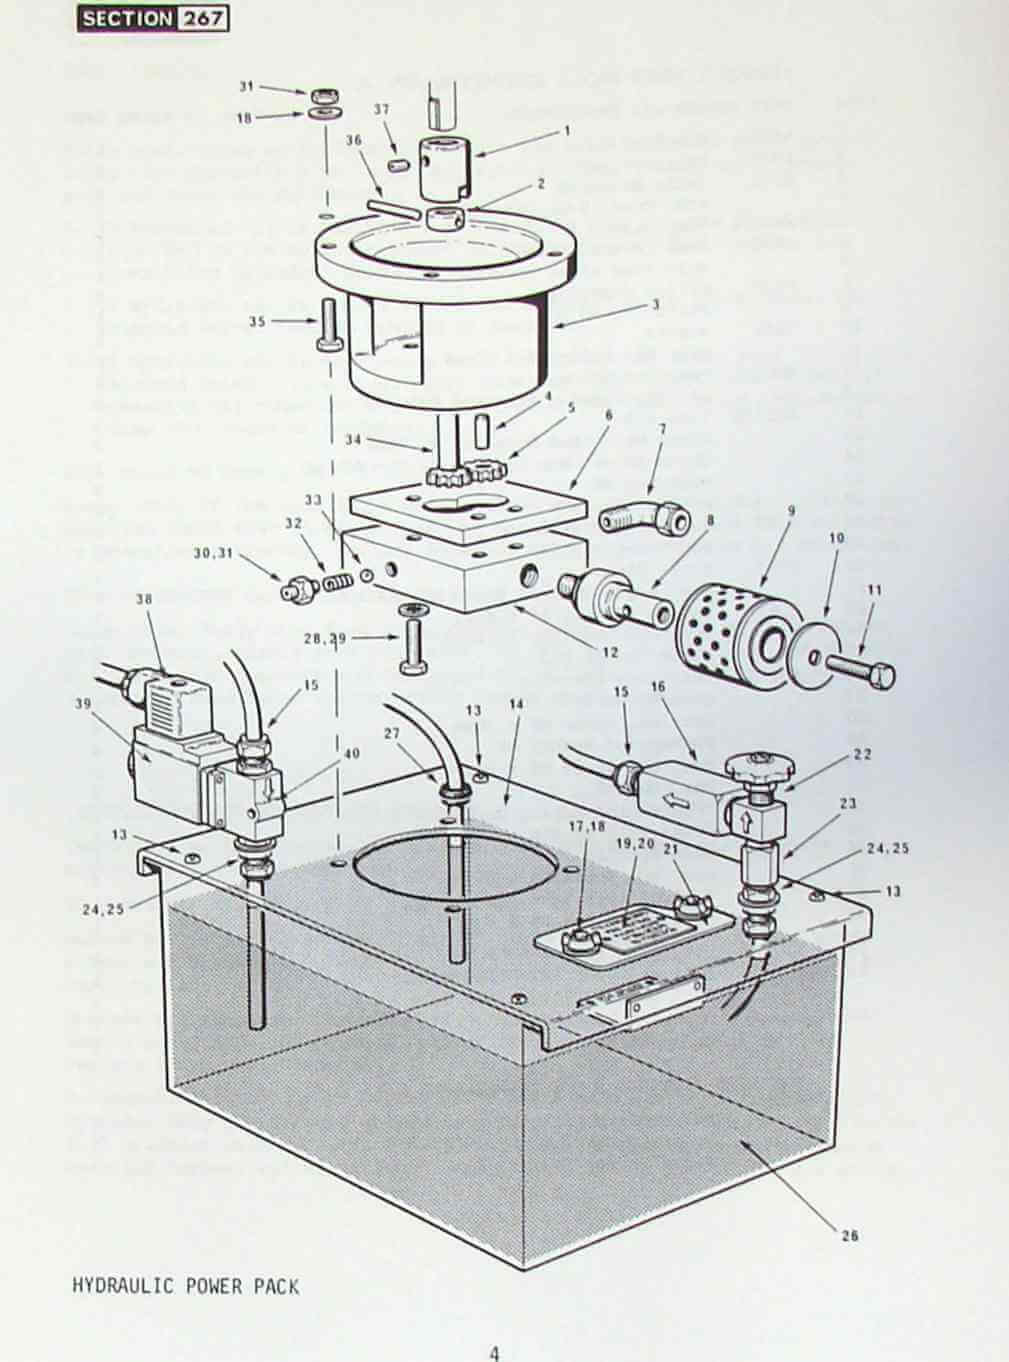 Kalamazoo startrite horizontal band saw h250a service parts manual